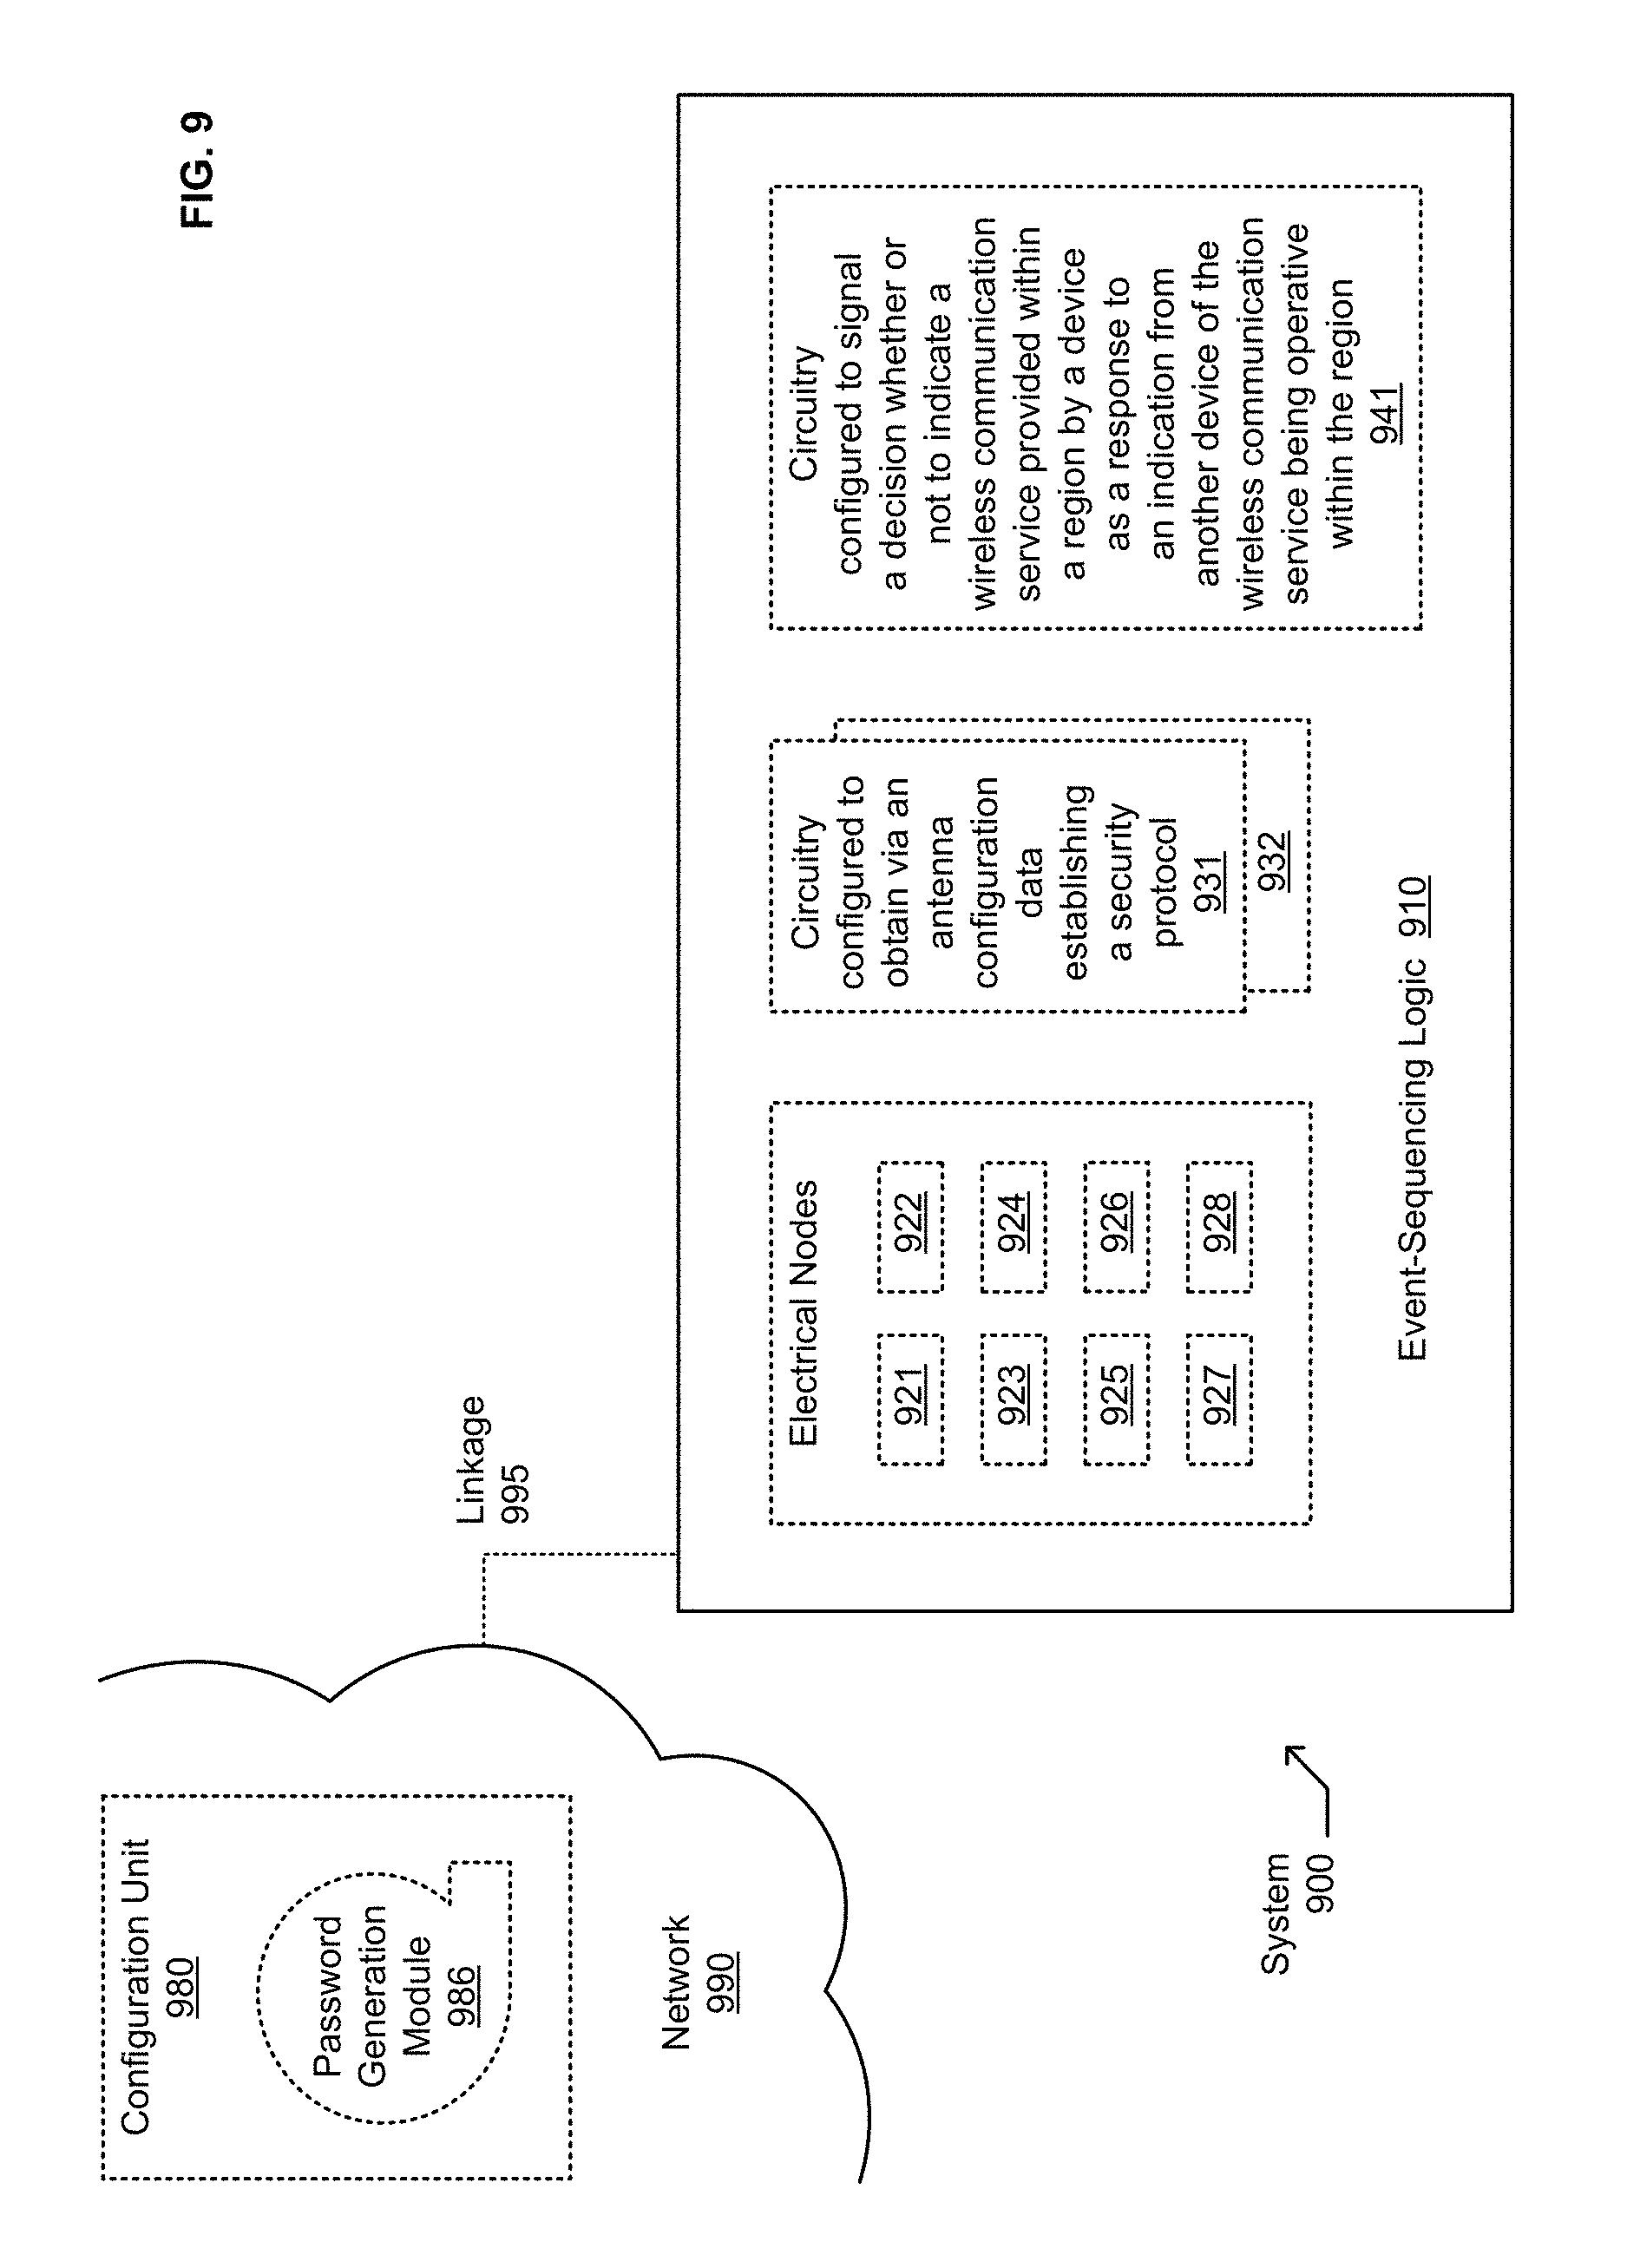 Patent US 9,980,114 B2